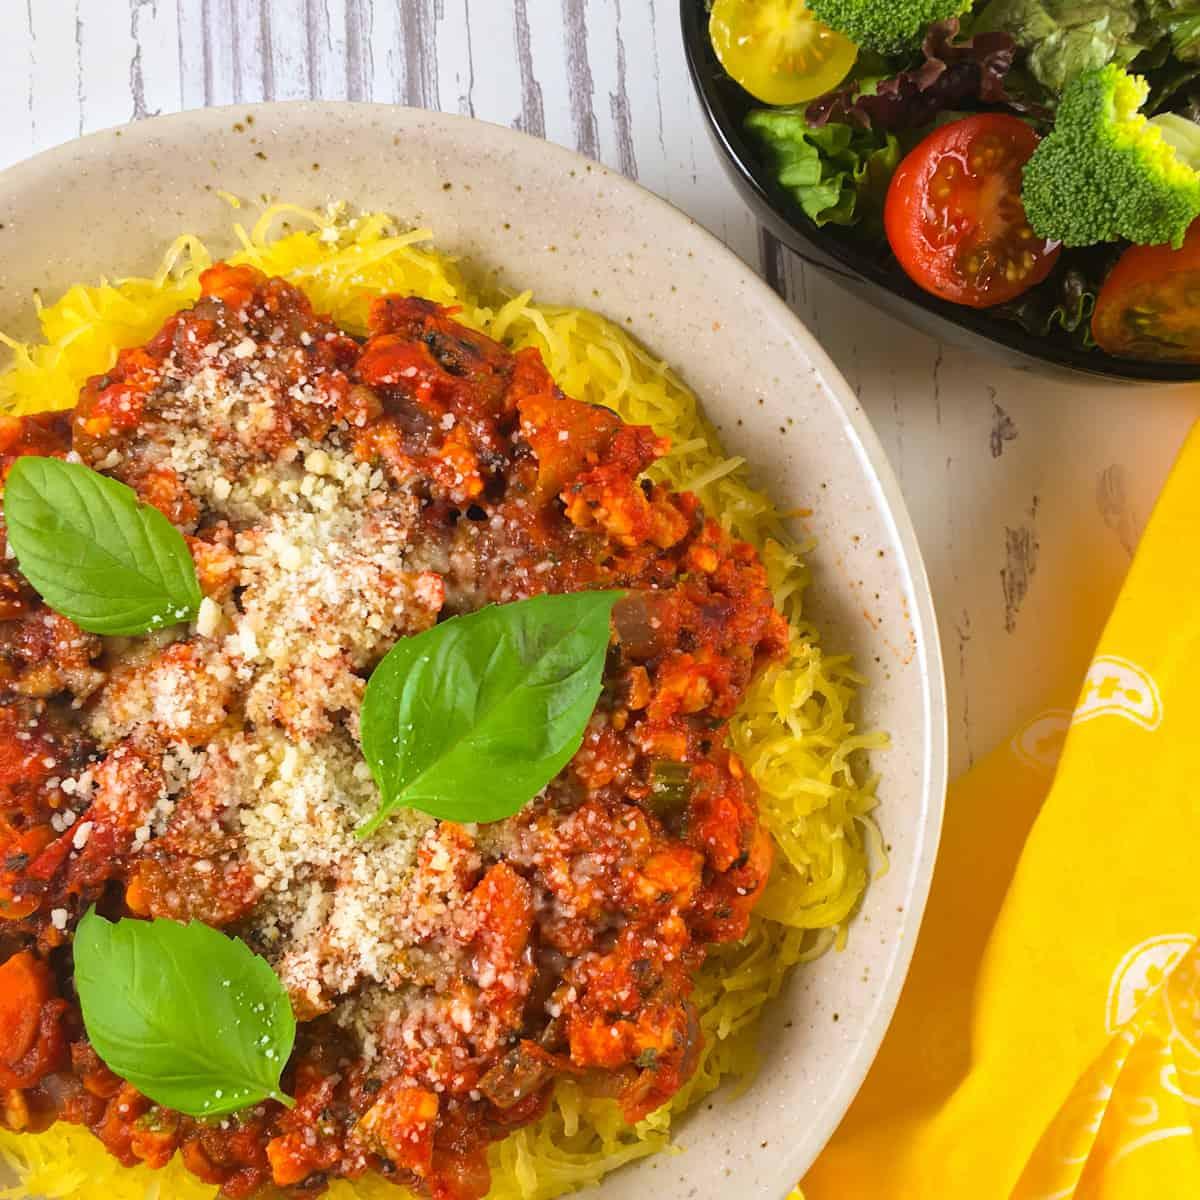 recipe for tempeh bolognese